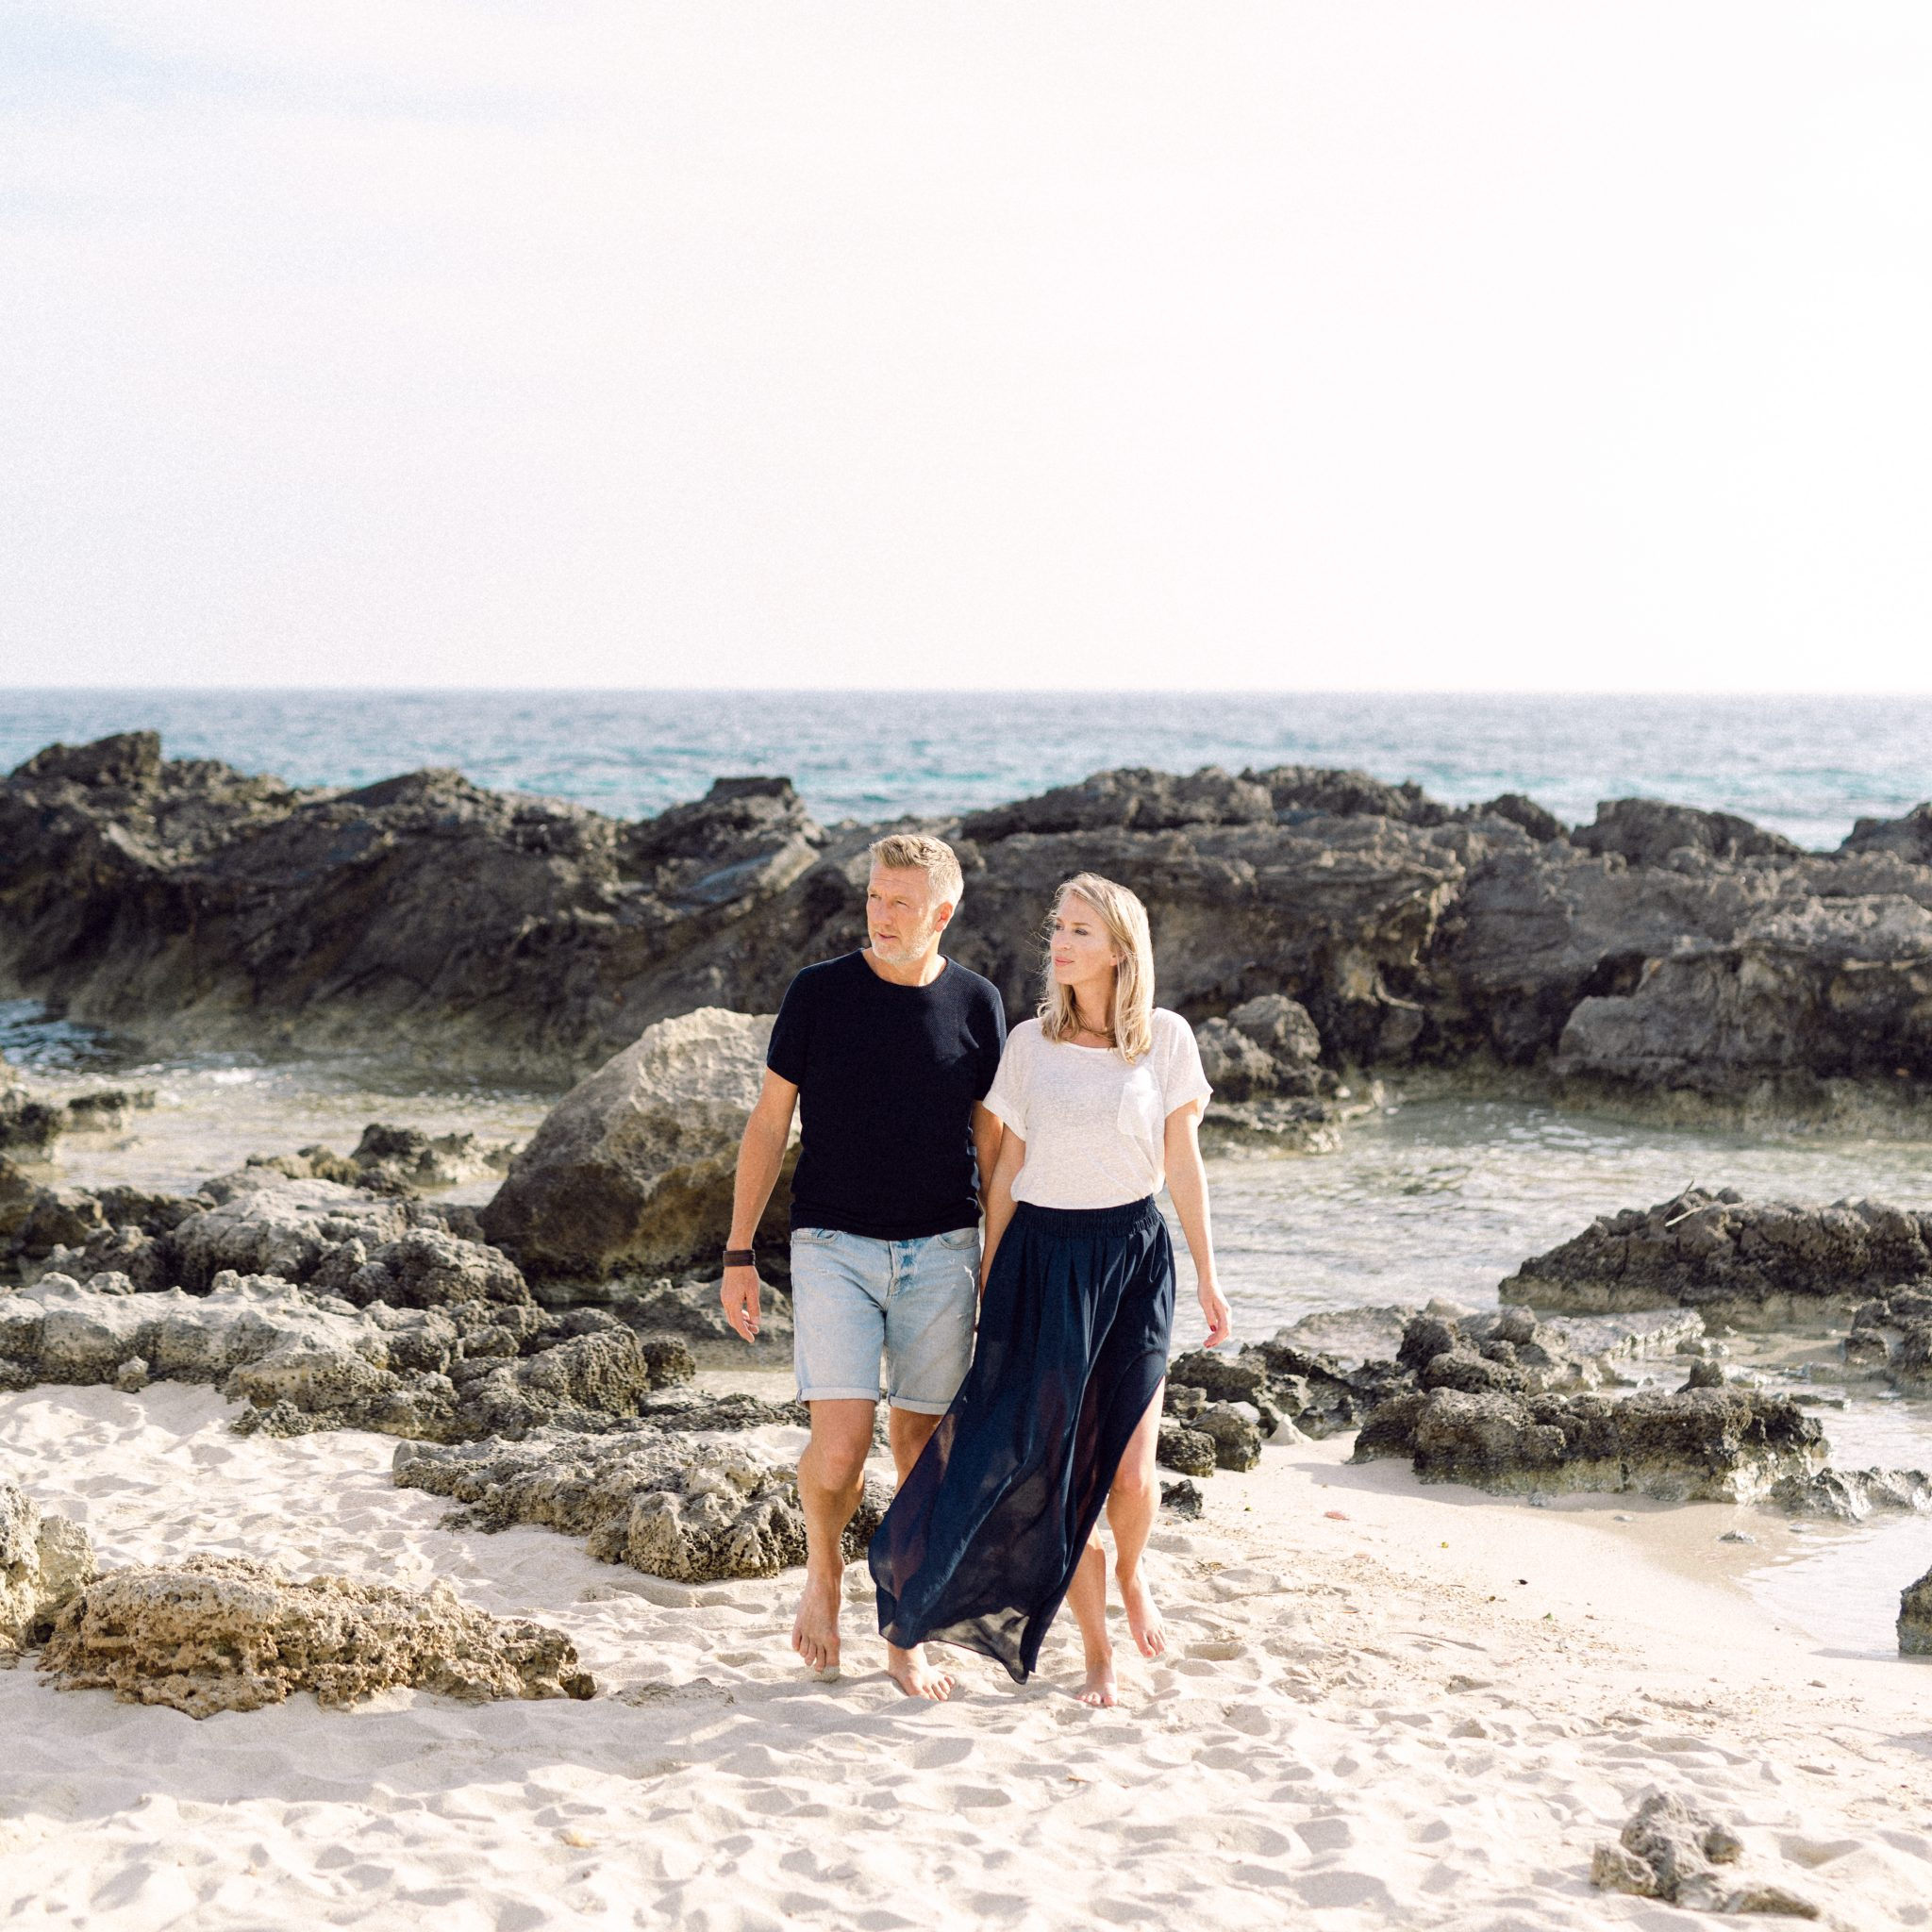 Michael Pilarzyck, Cindy Koeman